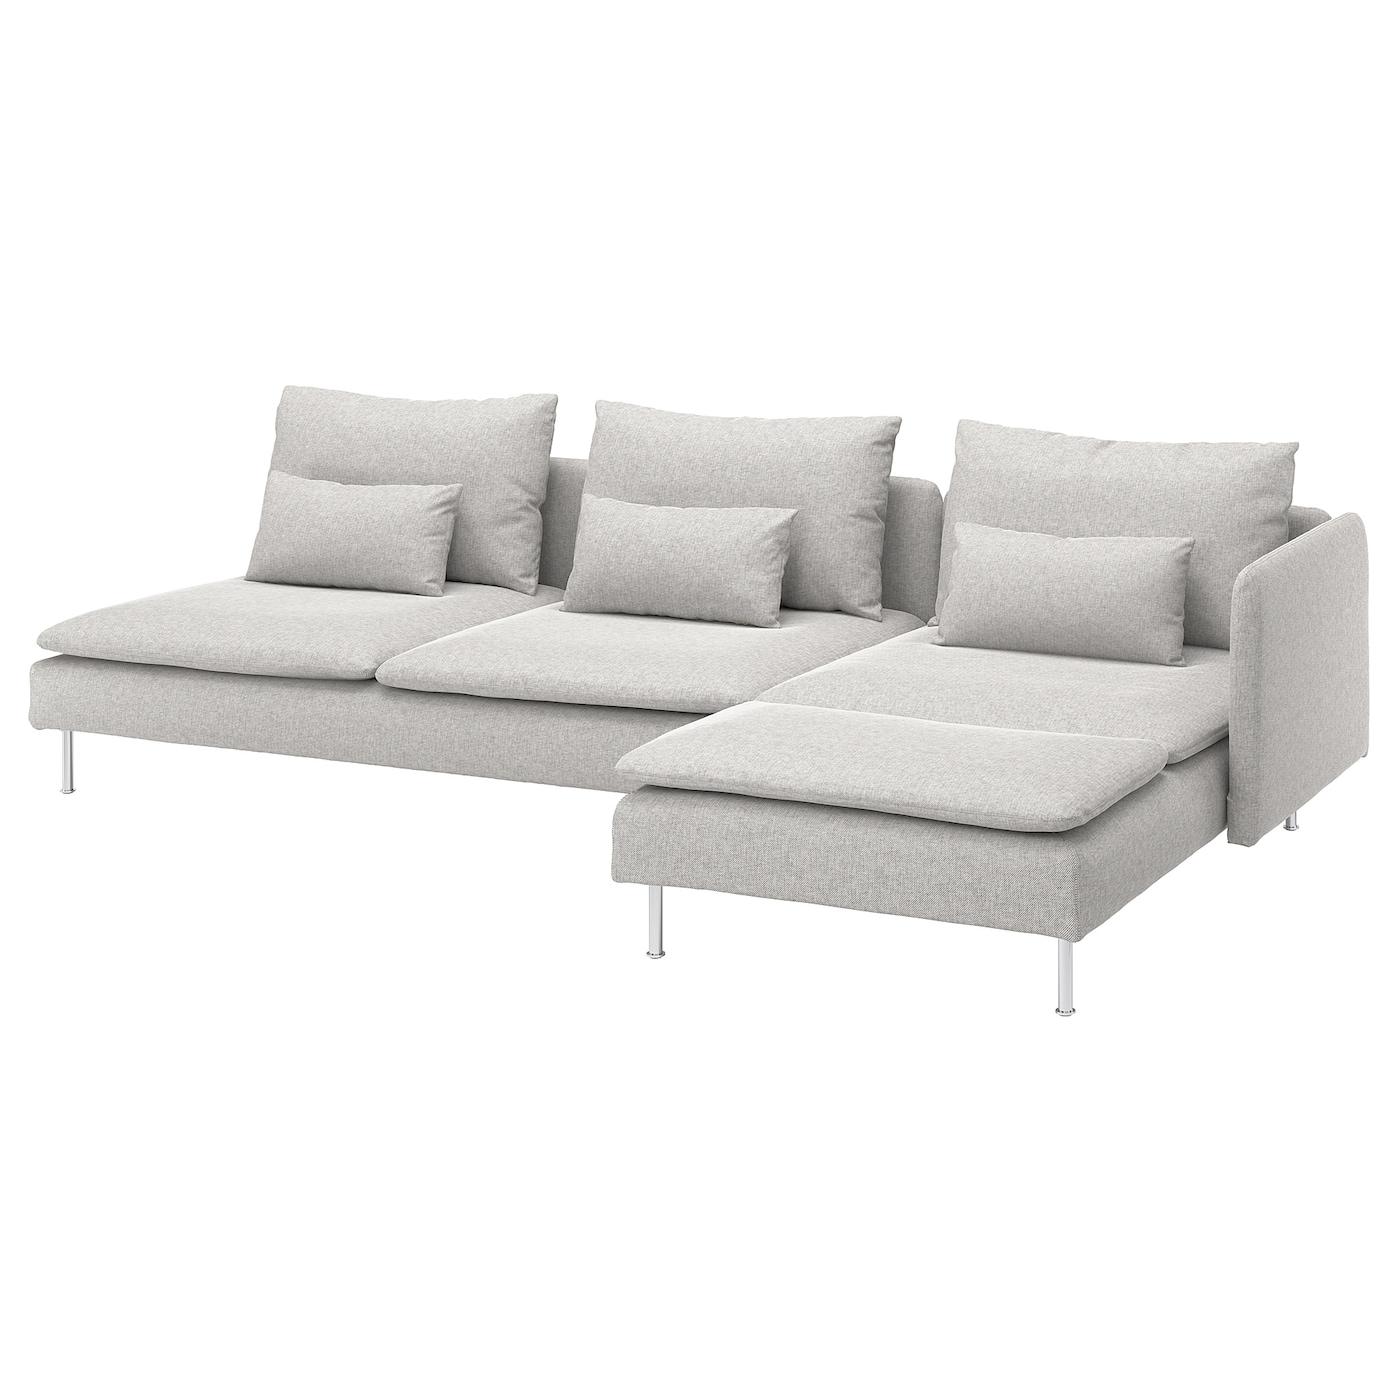 SÖderhamn 4 Seat Sofa With Chaise